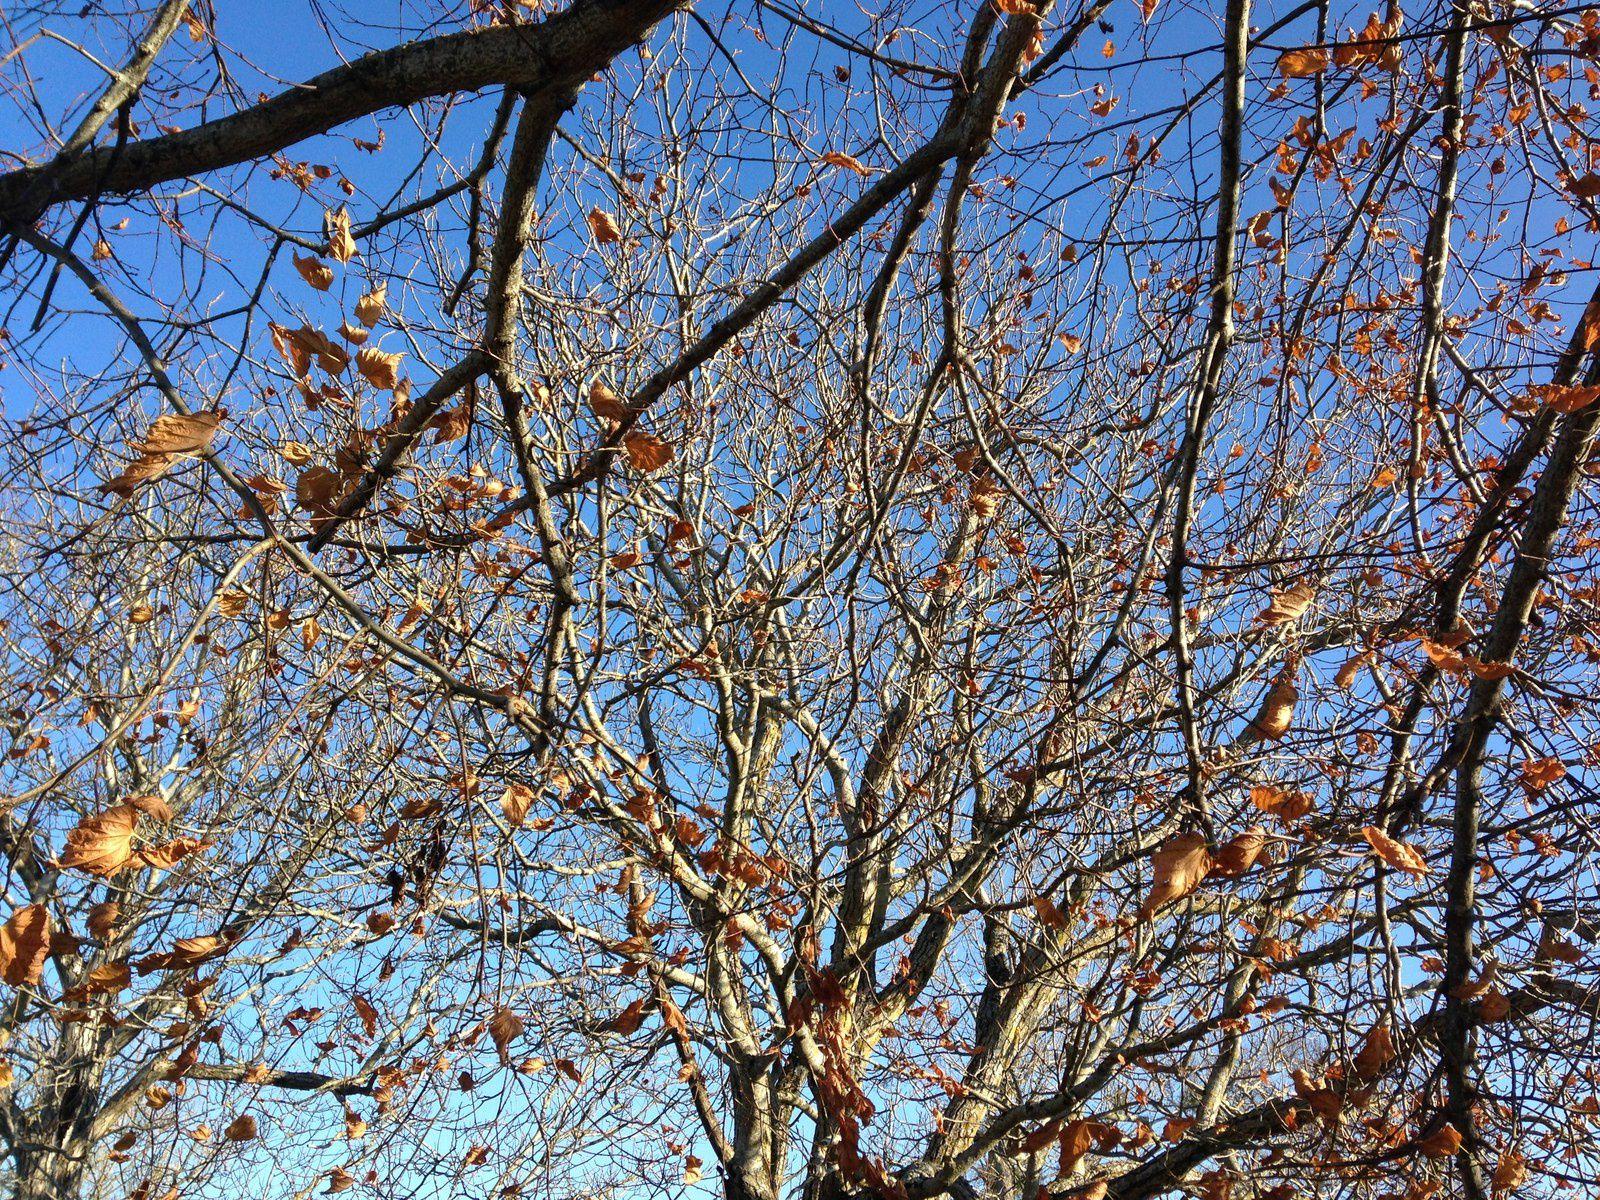 #auvergne, #arbre #charlotteblabla